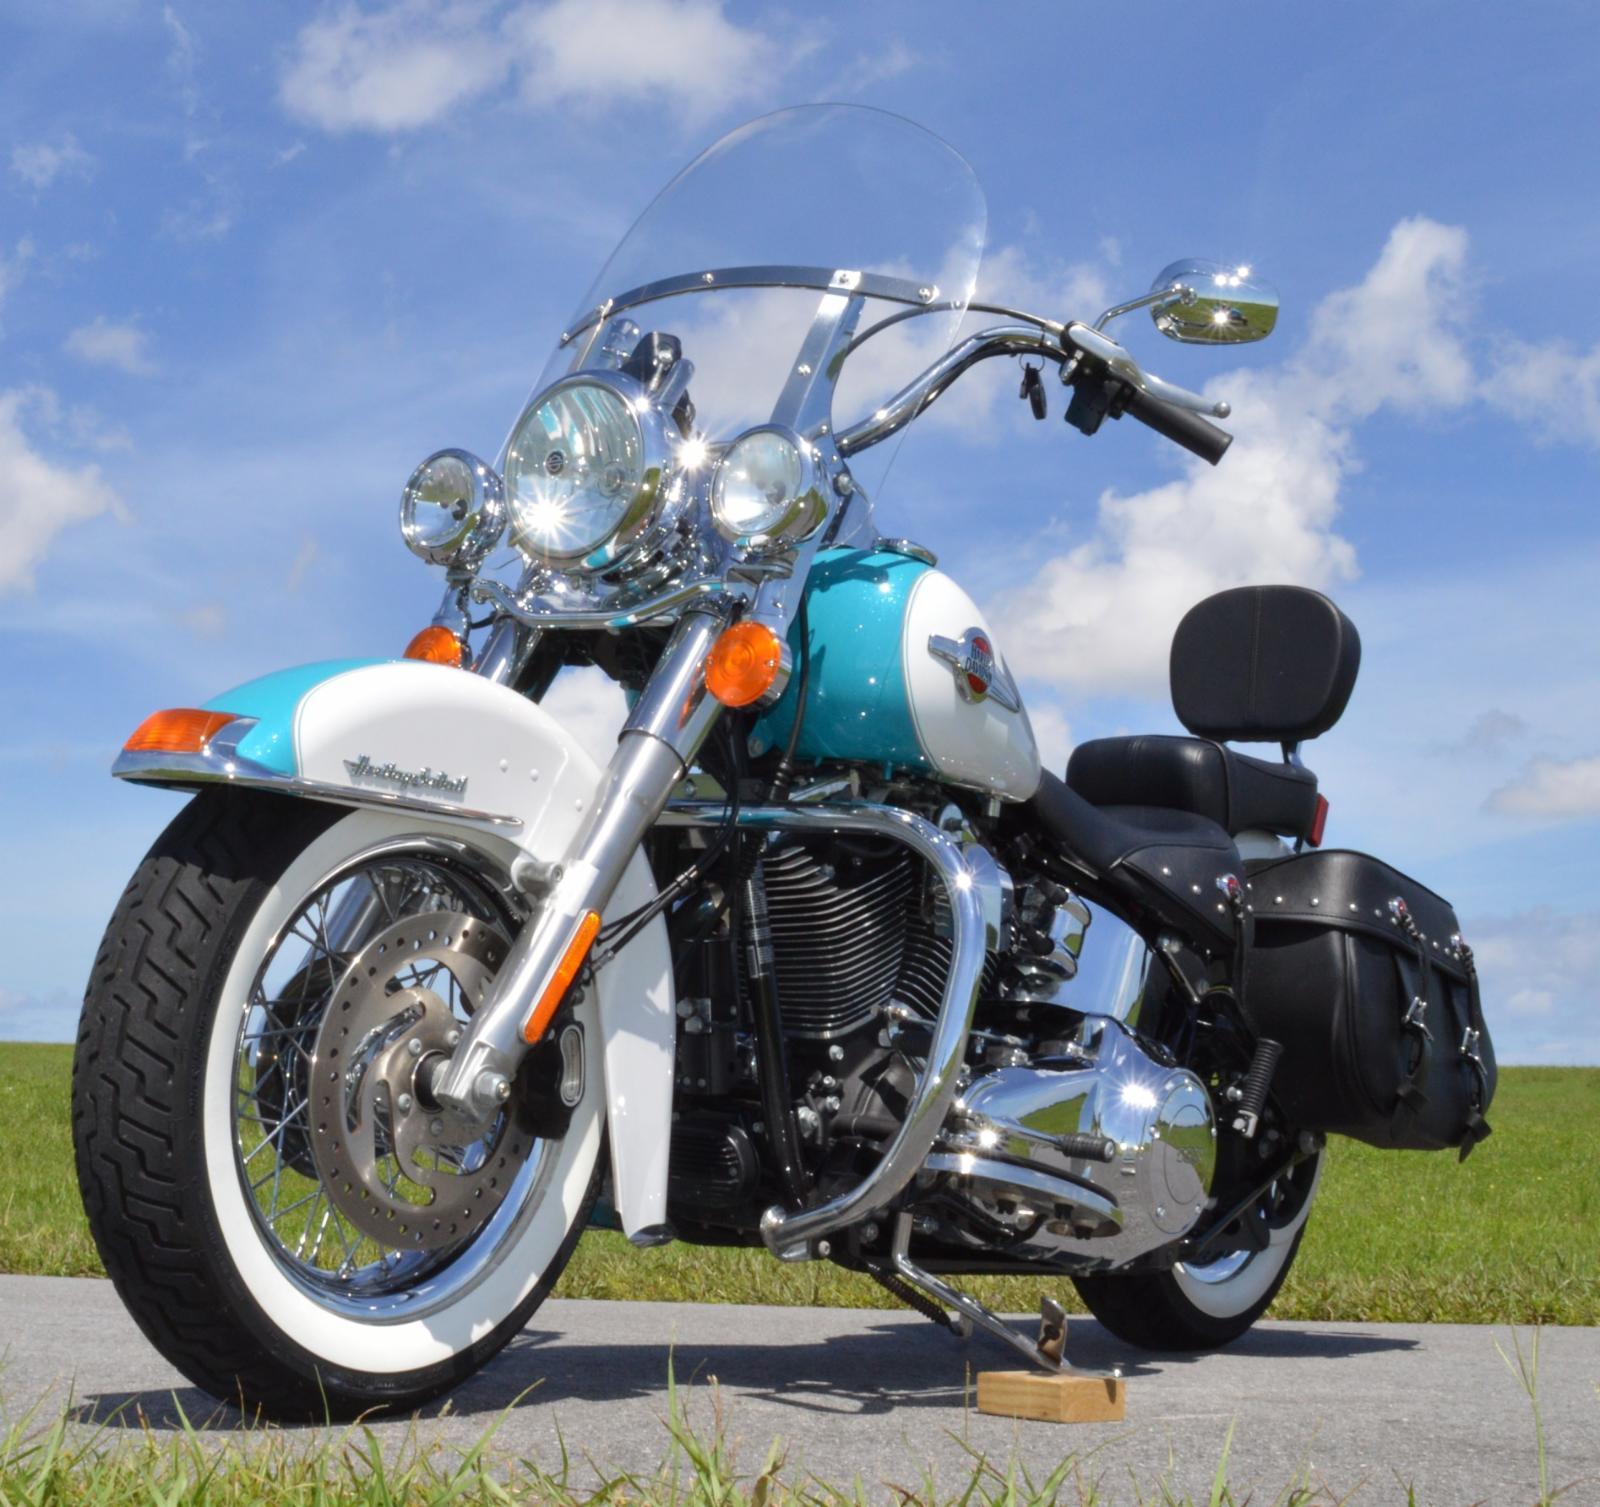 2016 Harley-Davidson FLSTC HERITAGE full